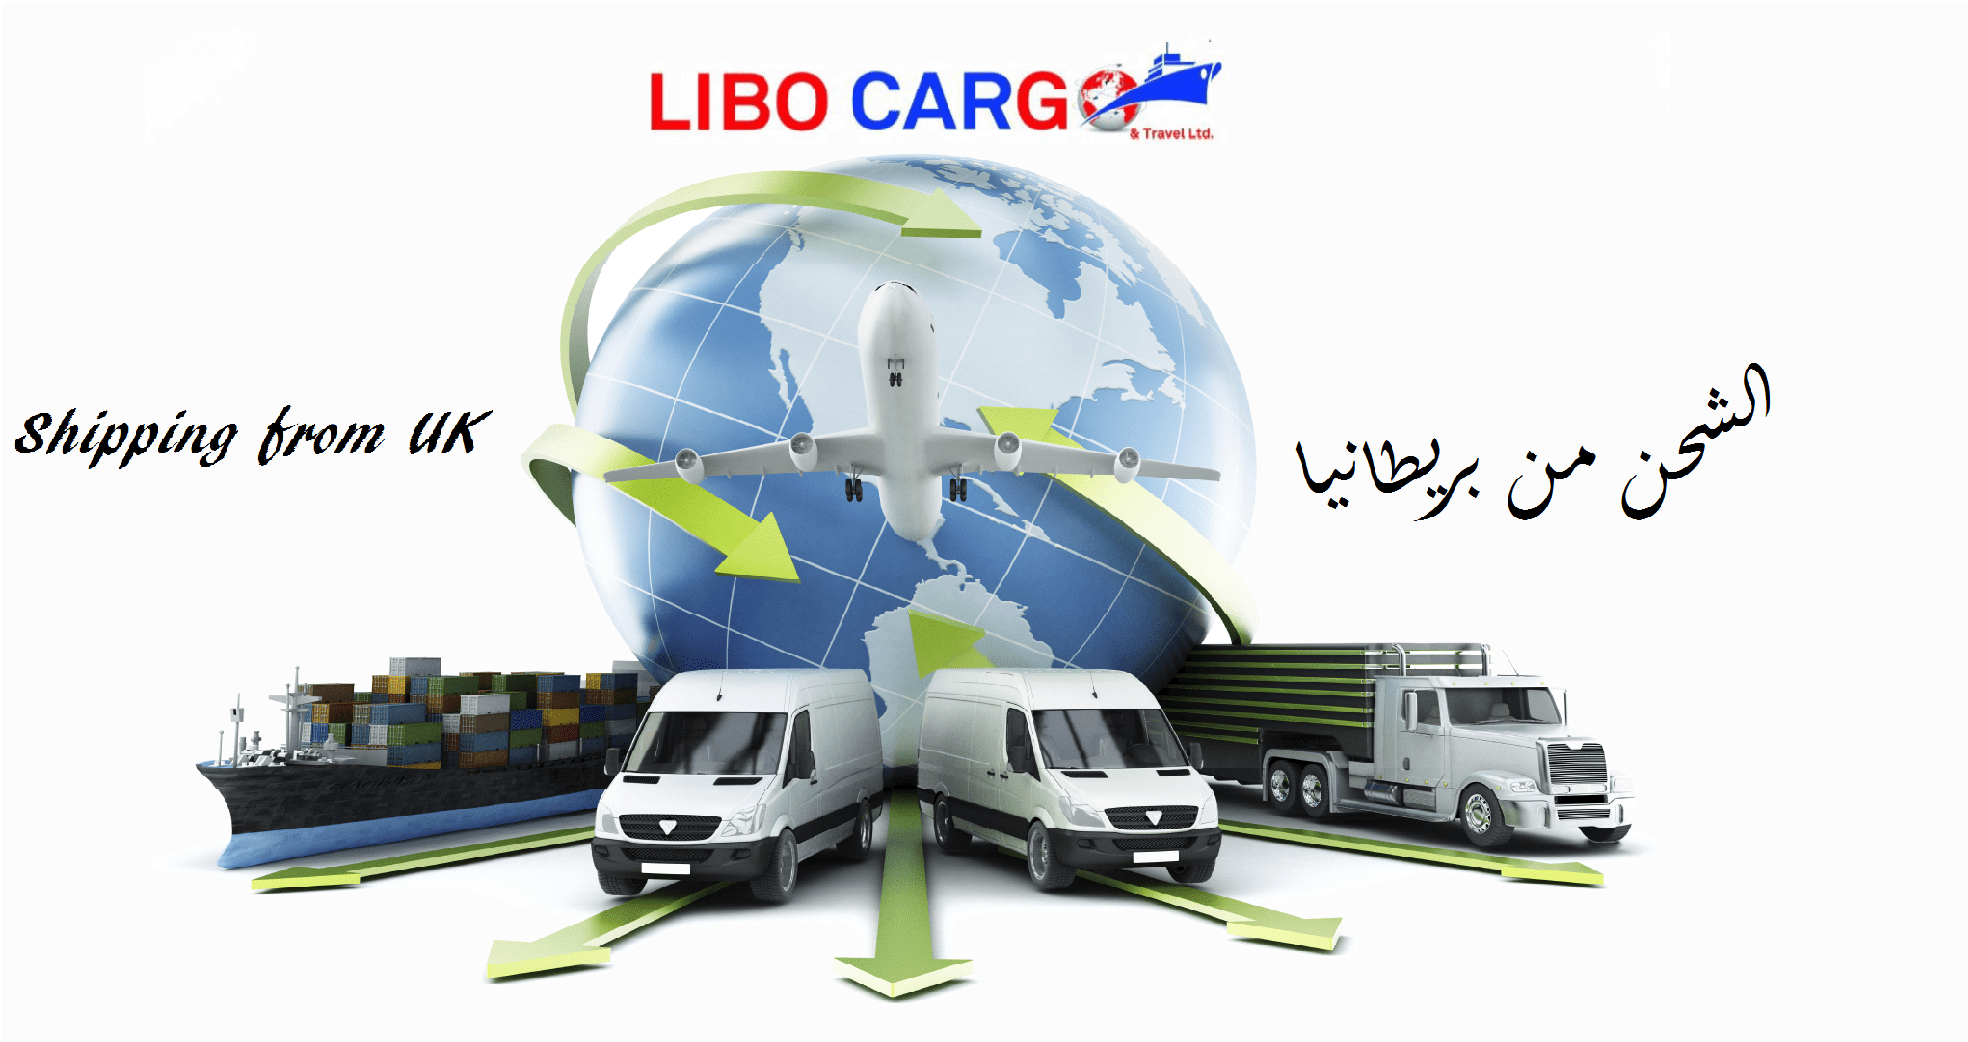 Libo cargo الشحن من بريطانيا Logo